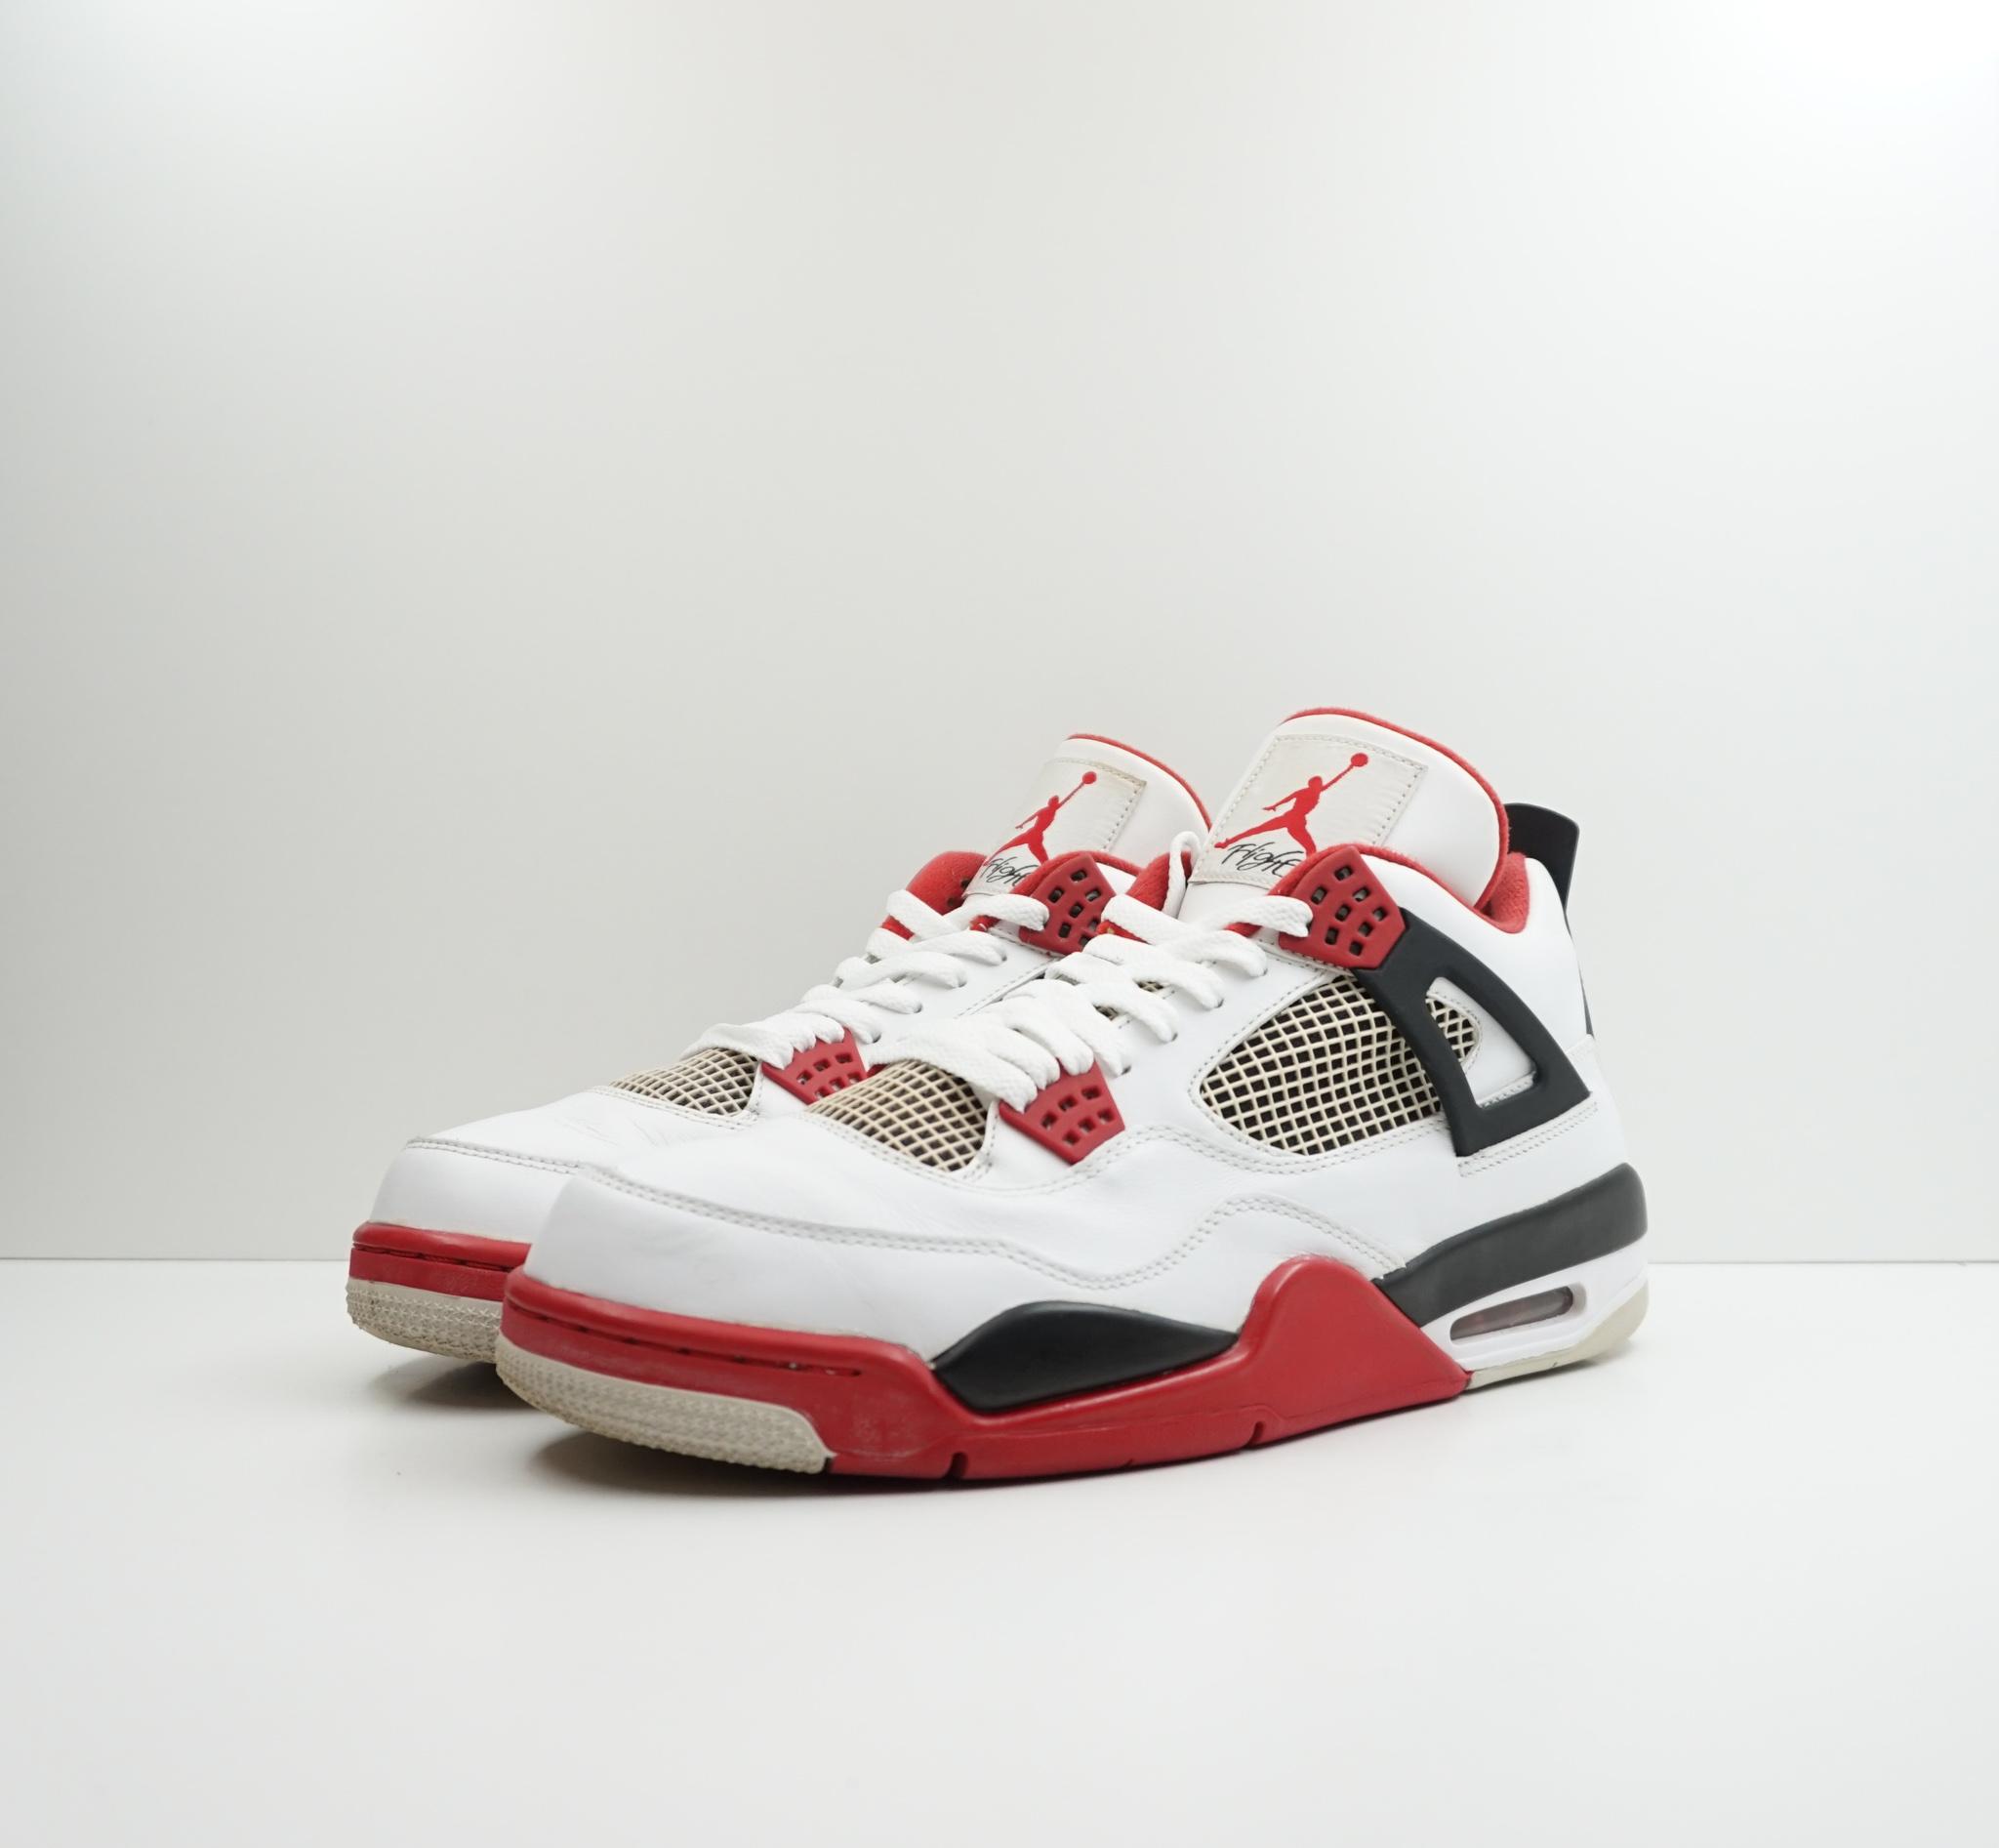 Jordan 4 Fire Red (2012)